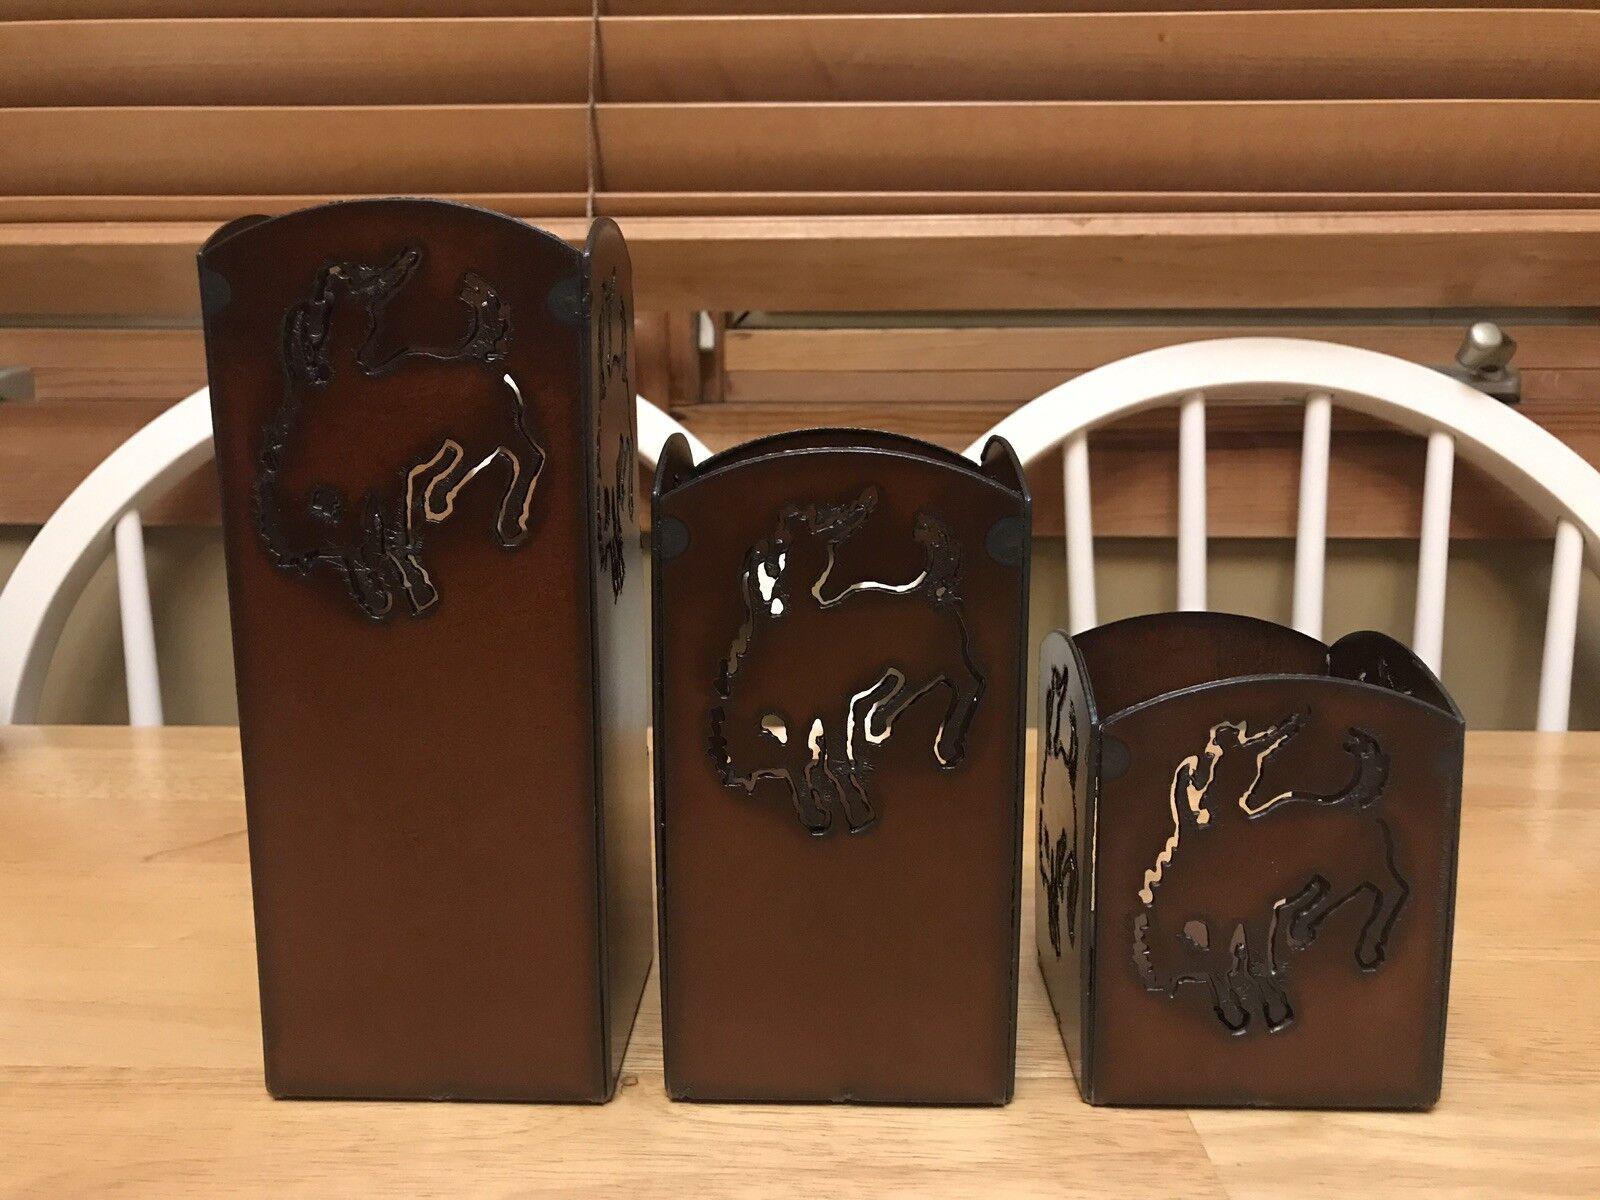 Western Rustic Metal Decor Bronc Rider Cowboy Ironwerks Candle Holders Set of 3